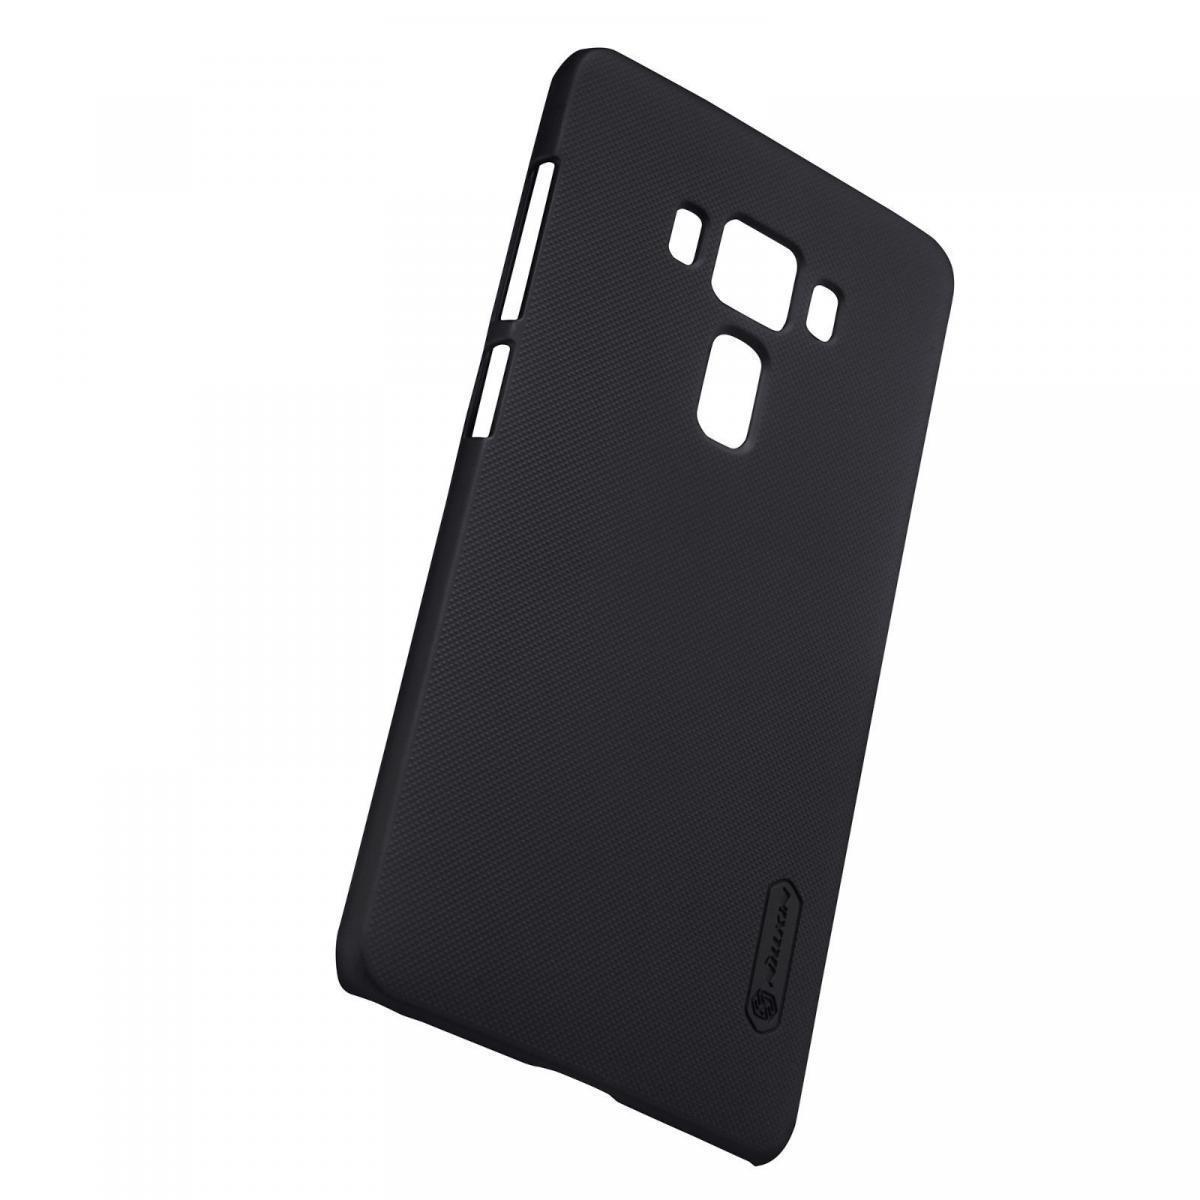 Чехол-накладка Nillkin Frosted Shield для Asus Zenfone 3 Deluxe ZS570KL пластиковый (черный) фото